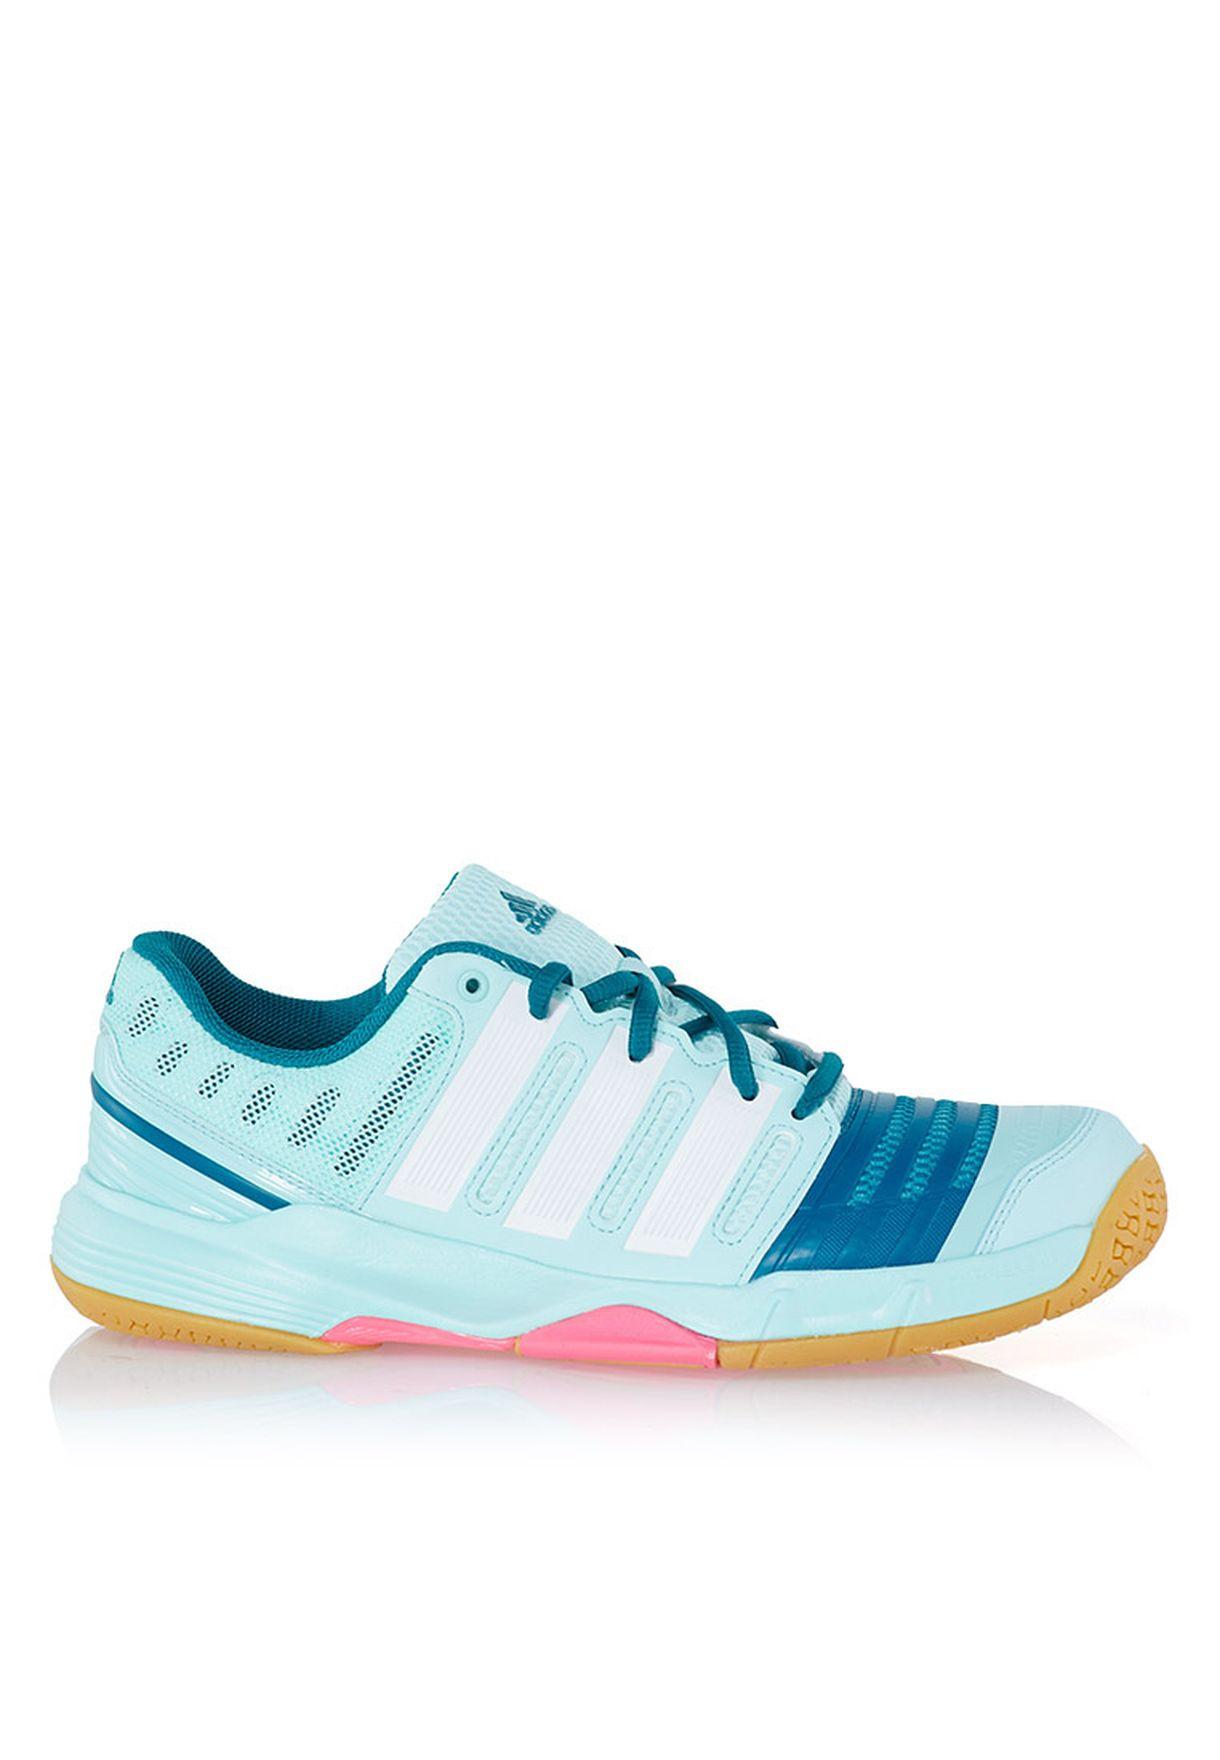 Court Stabil 11 W Sneakers